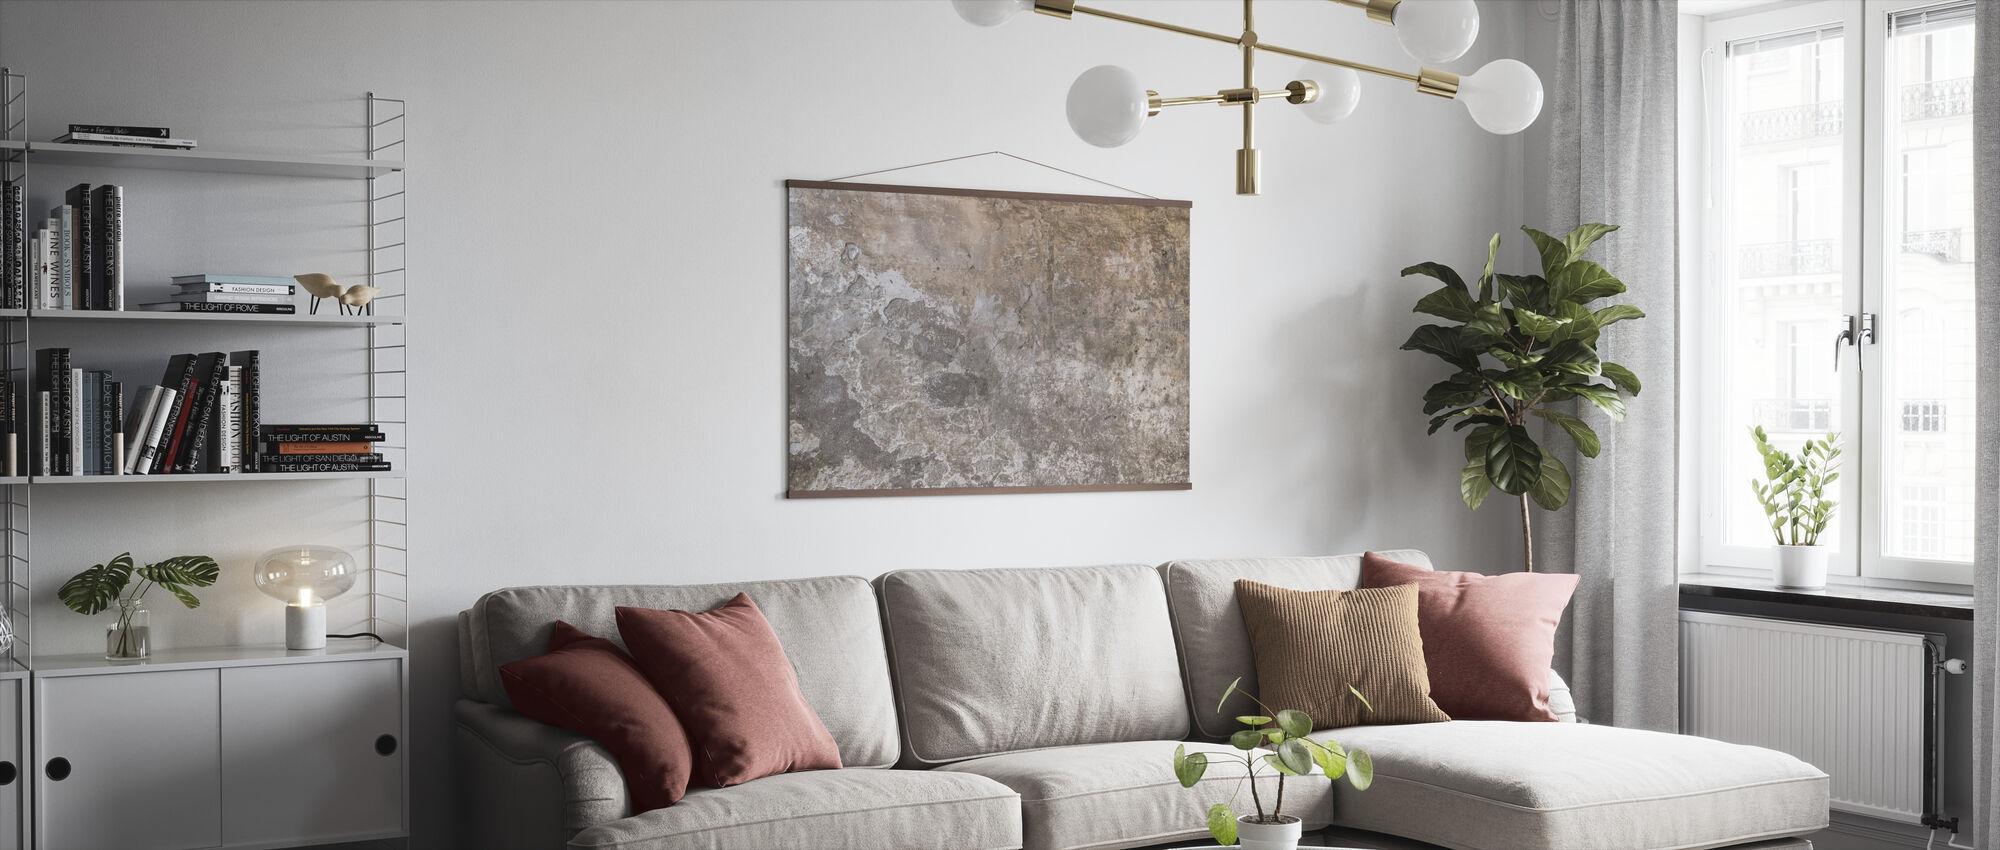 Alte Farbe rissige Wand - Poster - Wohnzimmer